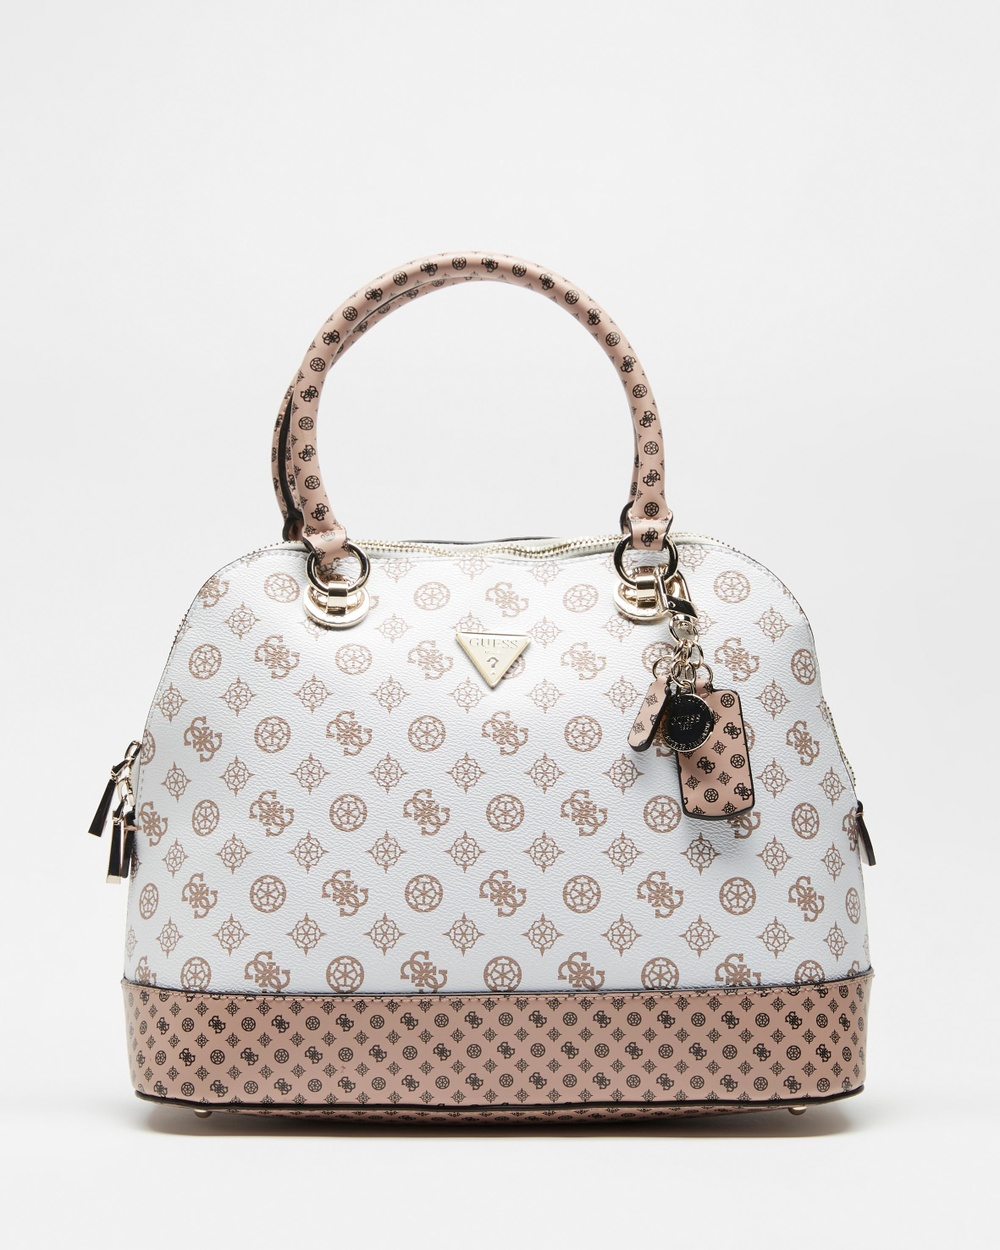 Guess Cessily Dome Satchel Bag Handbags White Multi